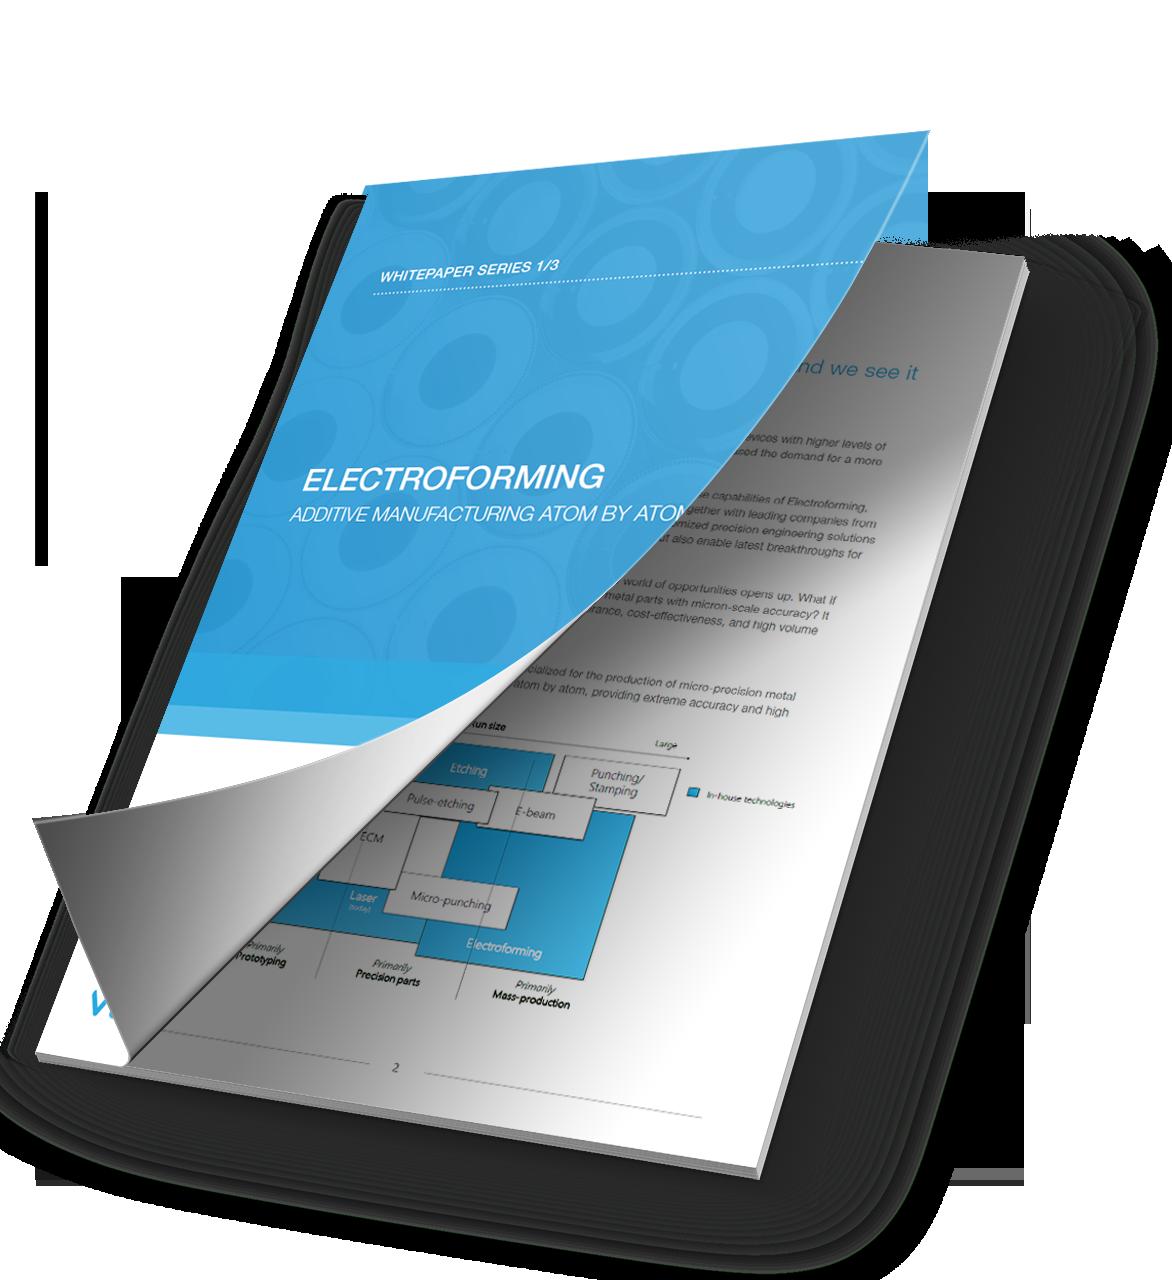 Whitepaper-Electroforming-mockup_new.png